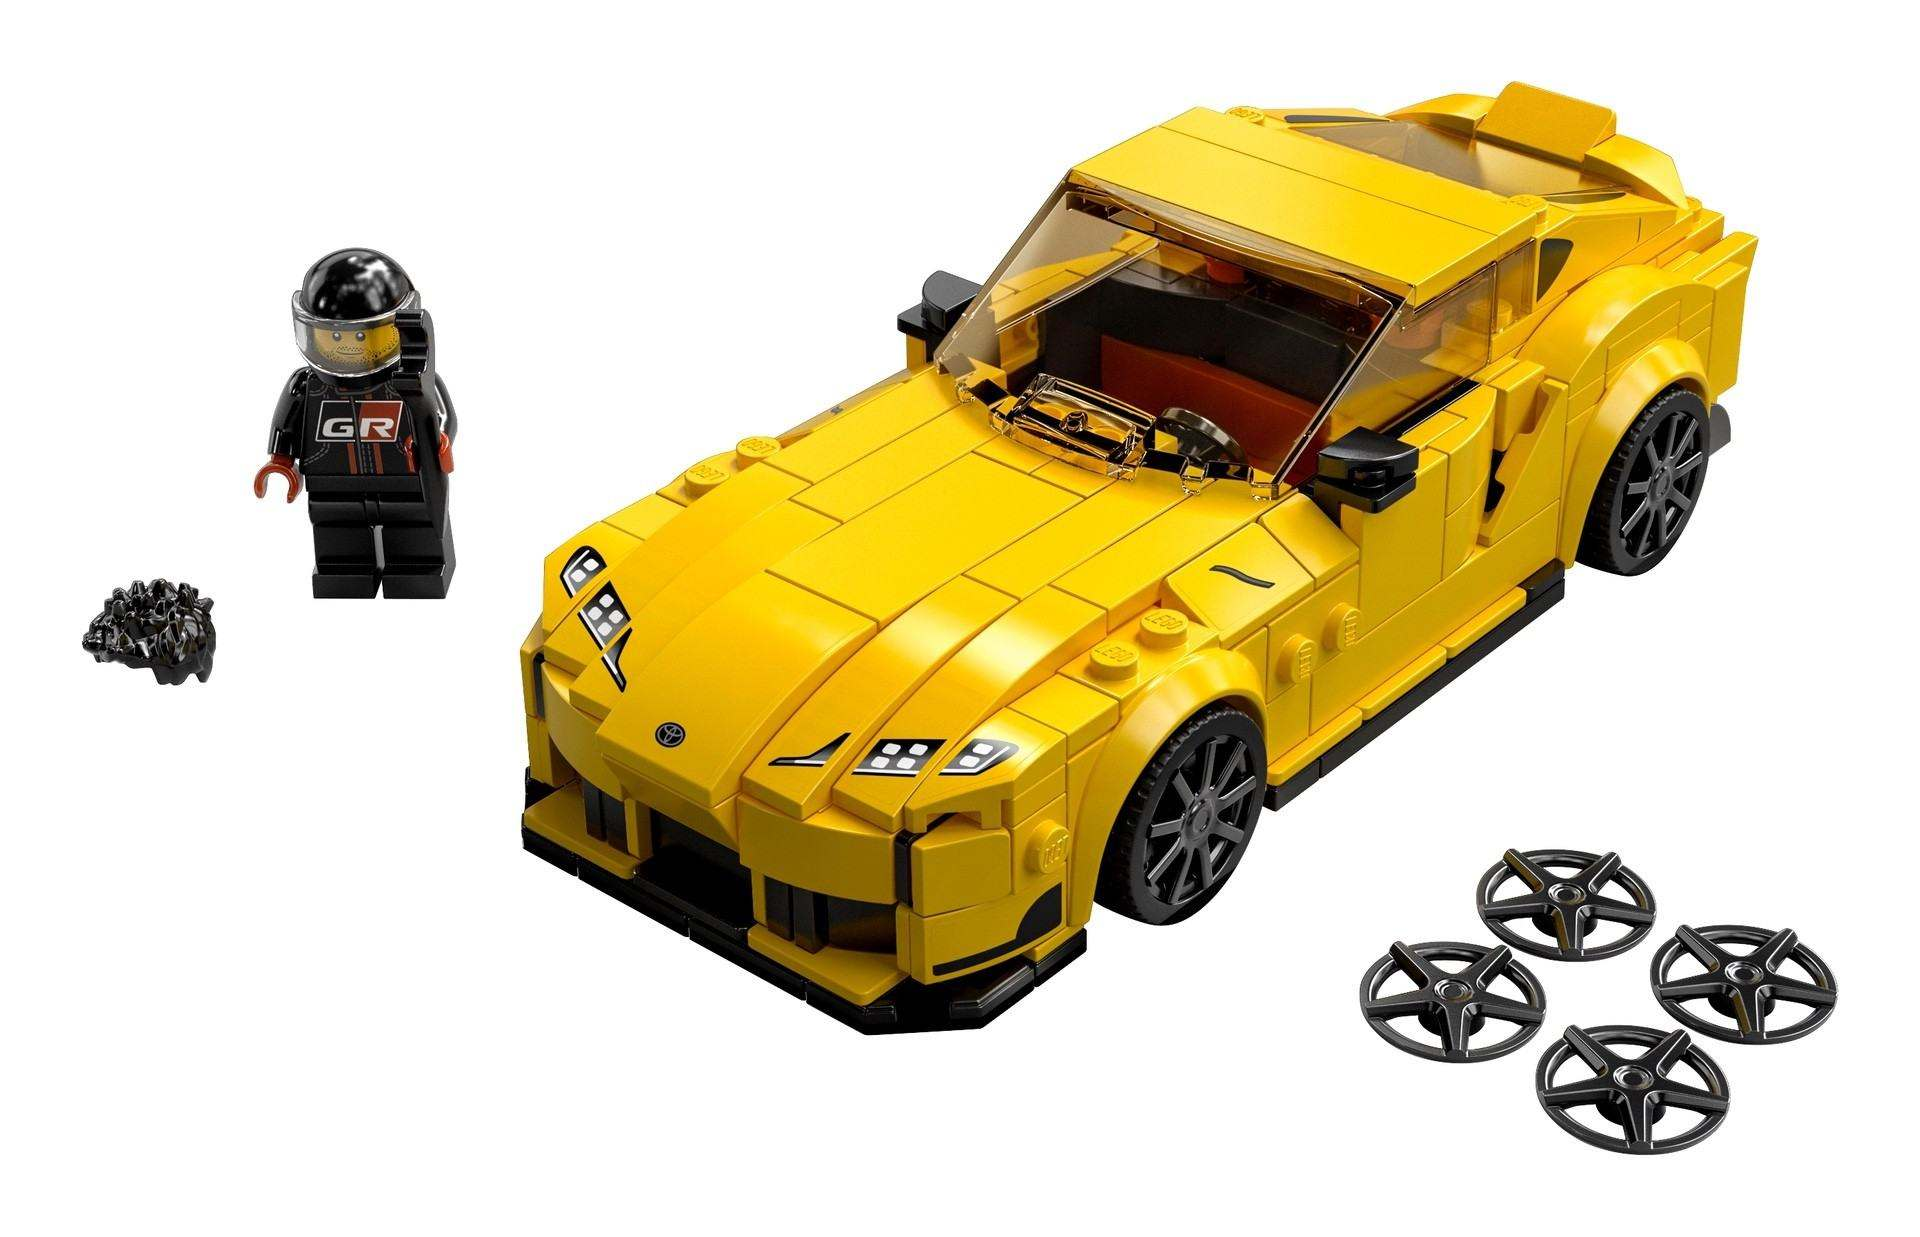 Toyota_GR_Supra_lego-0005